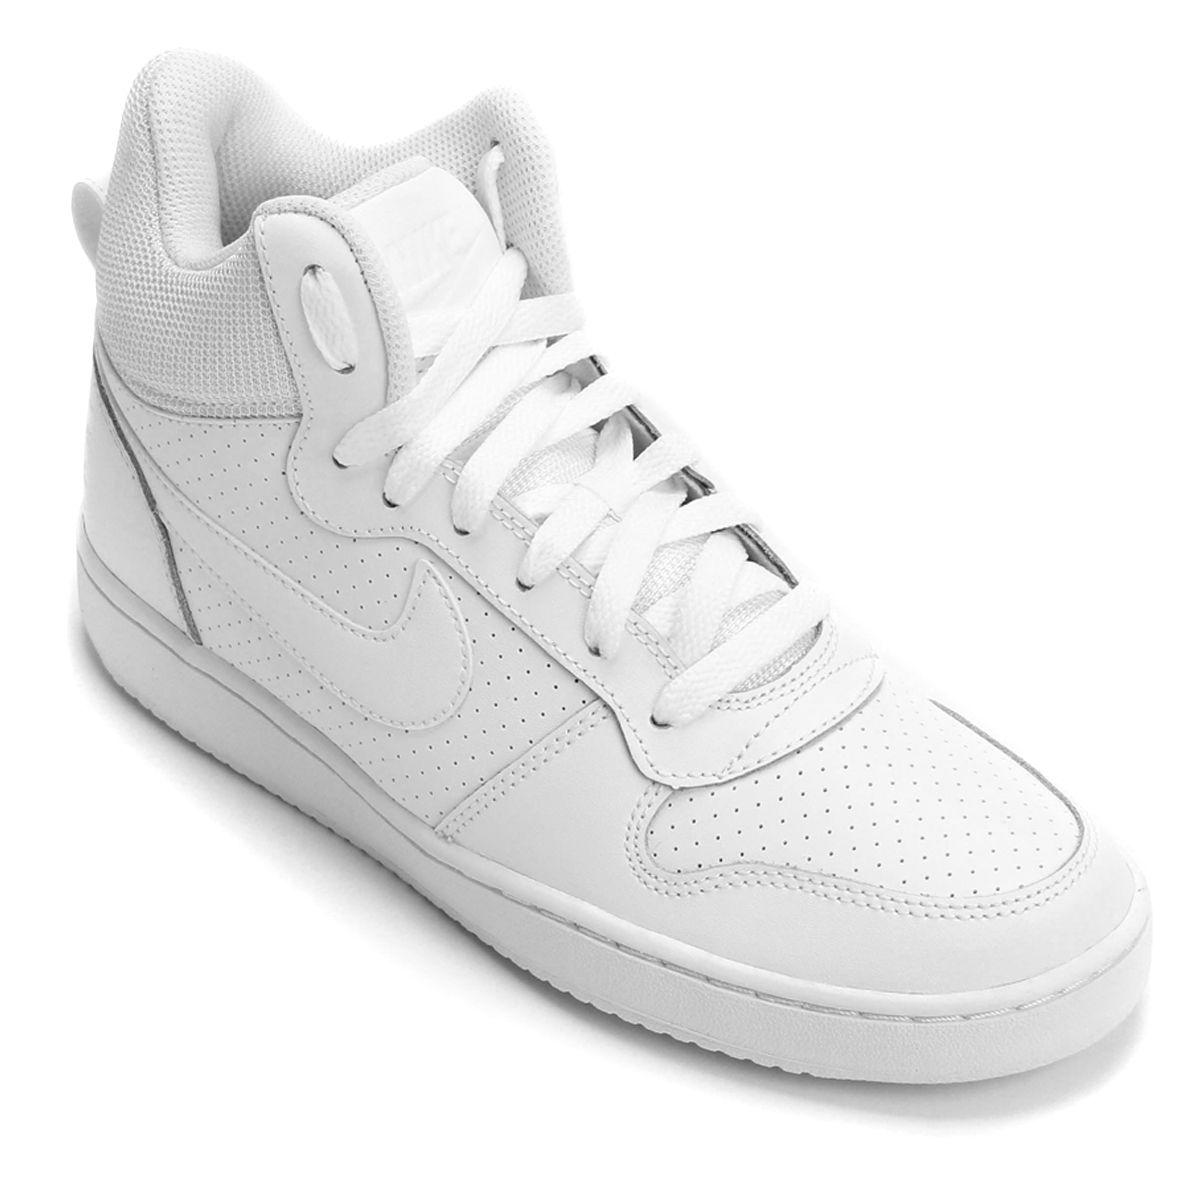 Tênis Couro Cano Alto Nike Recreation Mid Feminino - Branco ... 839b905a6ee0c